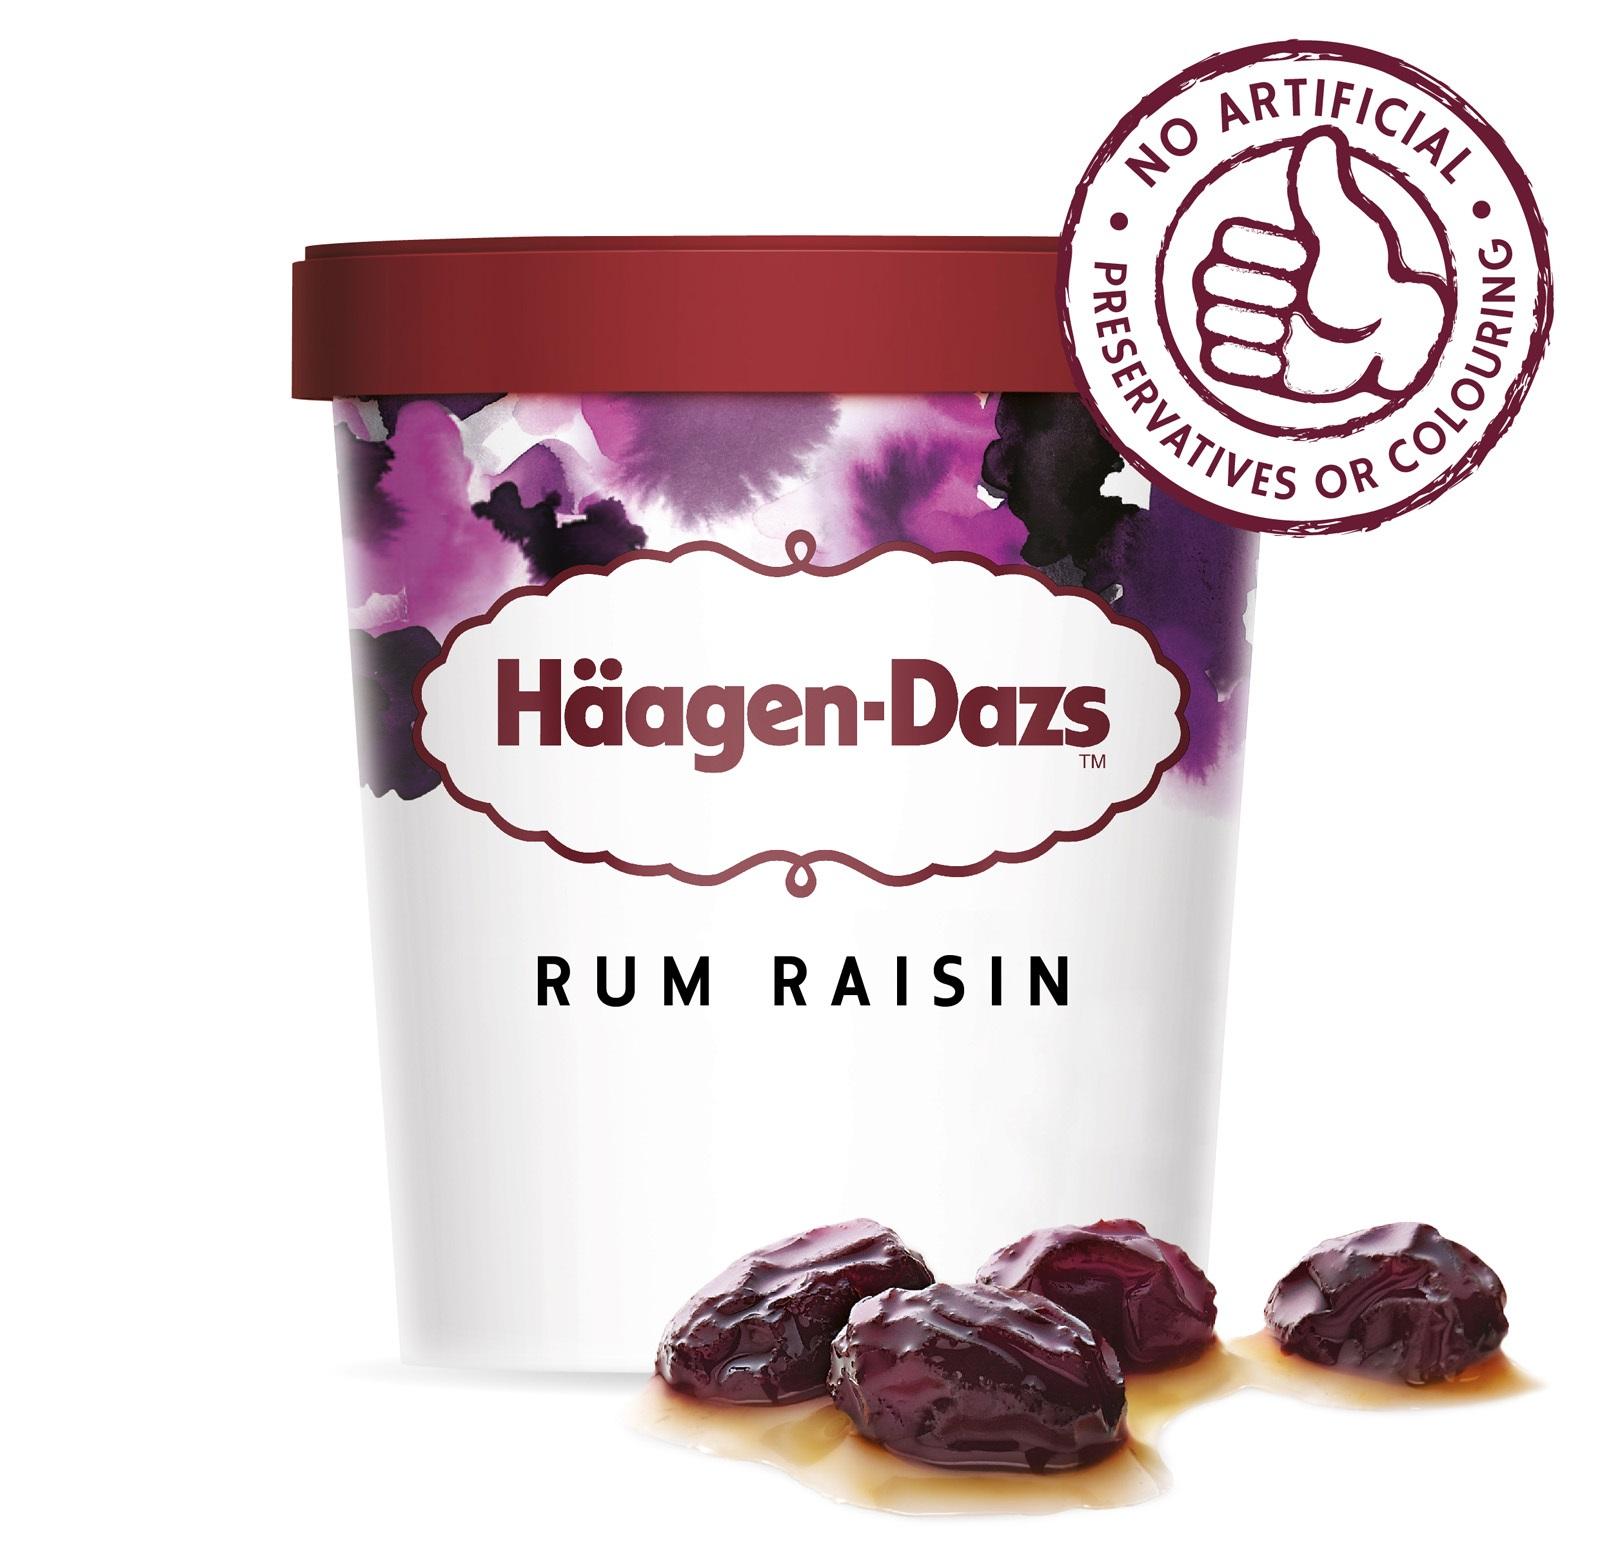 Rum & Raisin Pint